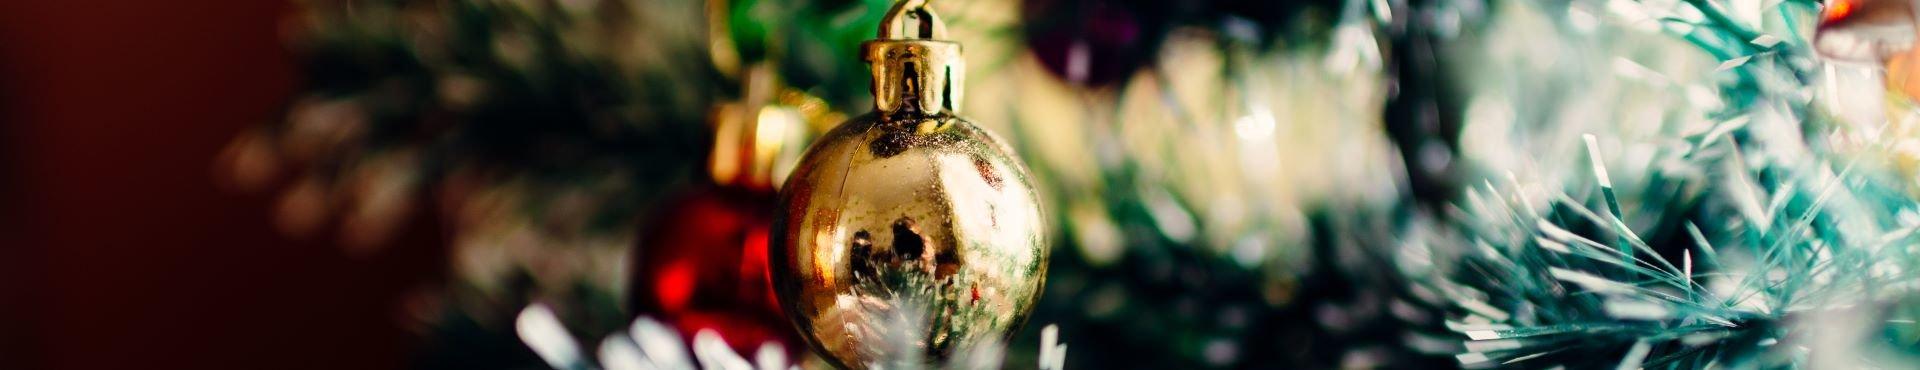 Christmas Bauble | Shine Lawyers